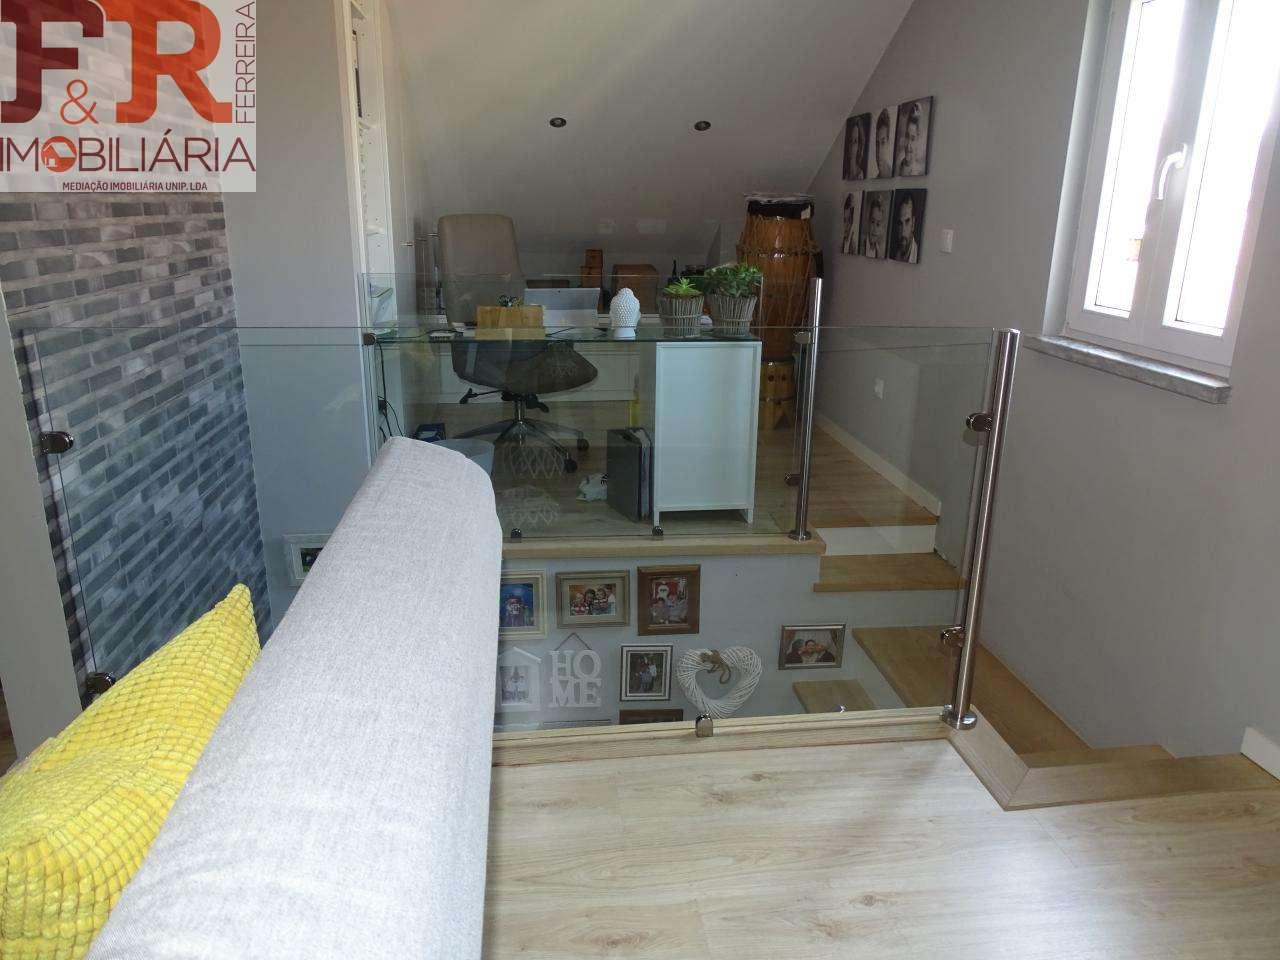 Apartamento para comprar, Quinta do Conde, Setúbal - Foto 18